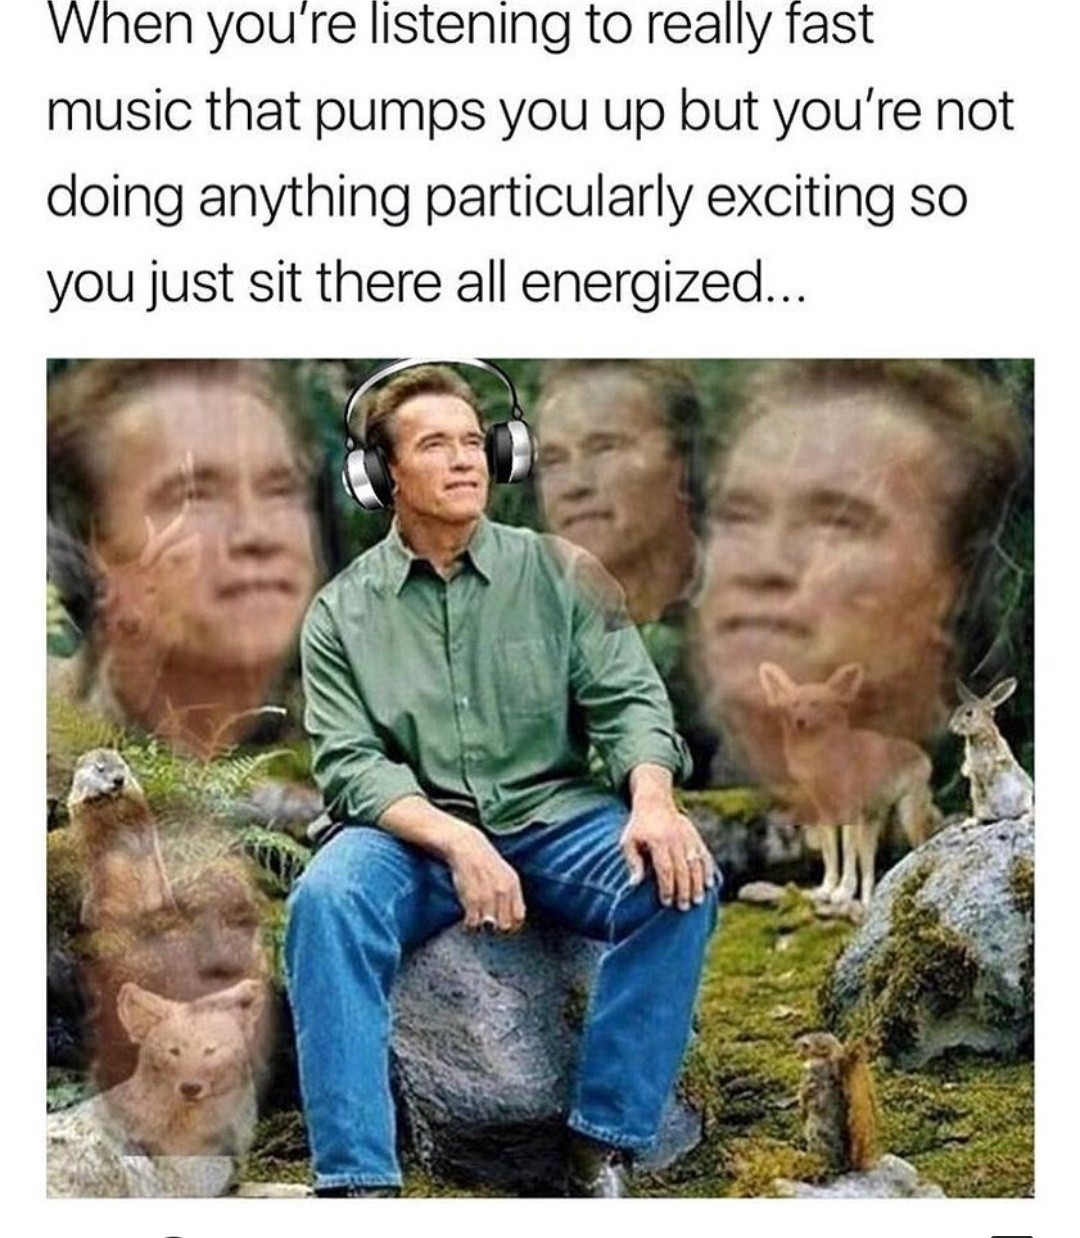 It's called Psytrance - meme